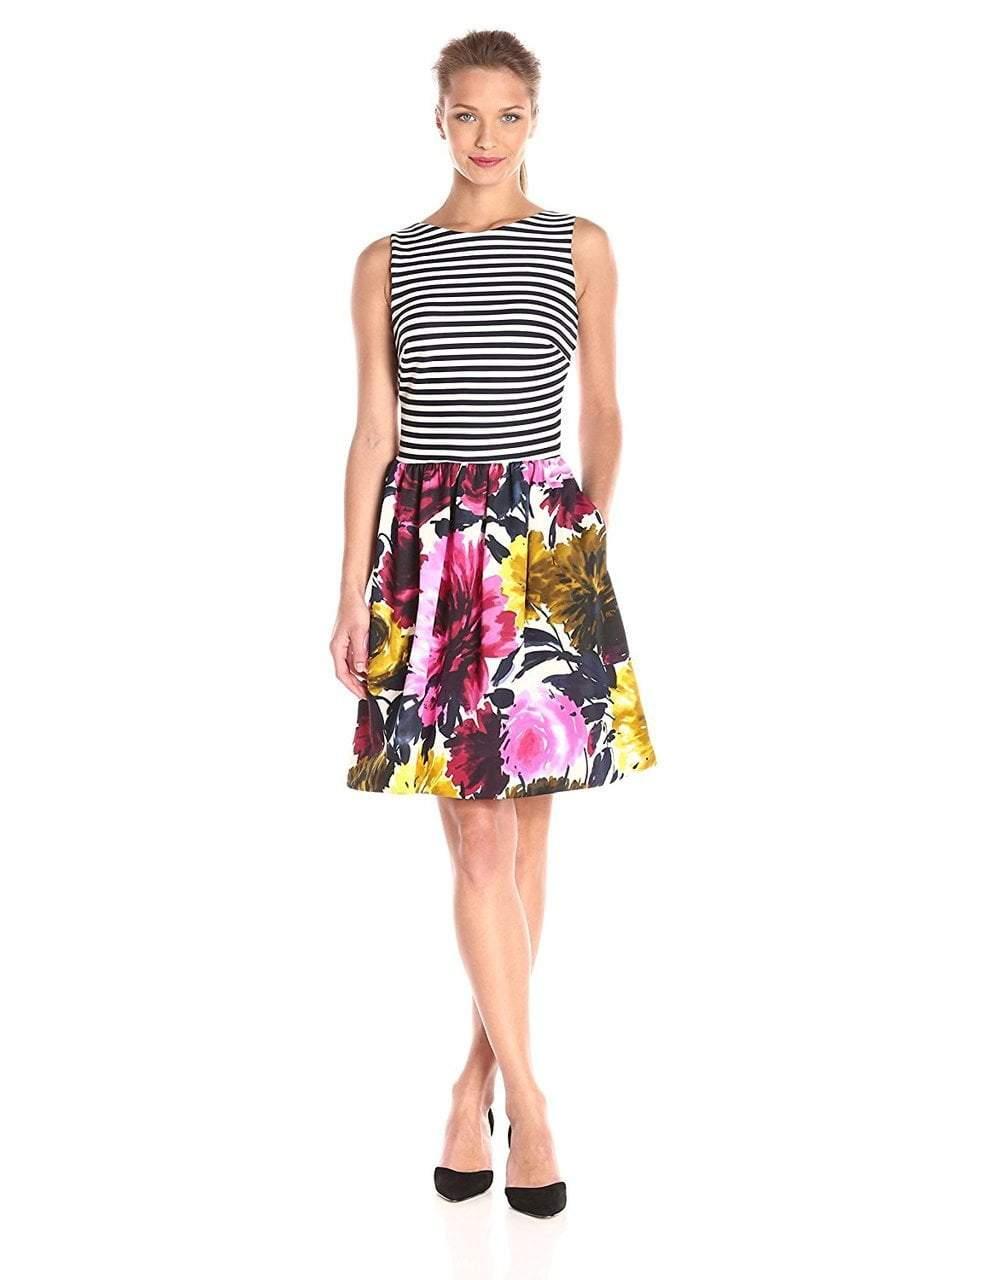 Taylor - Stripe and Floral Print A-line Dress 5997M